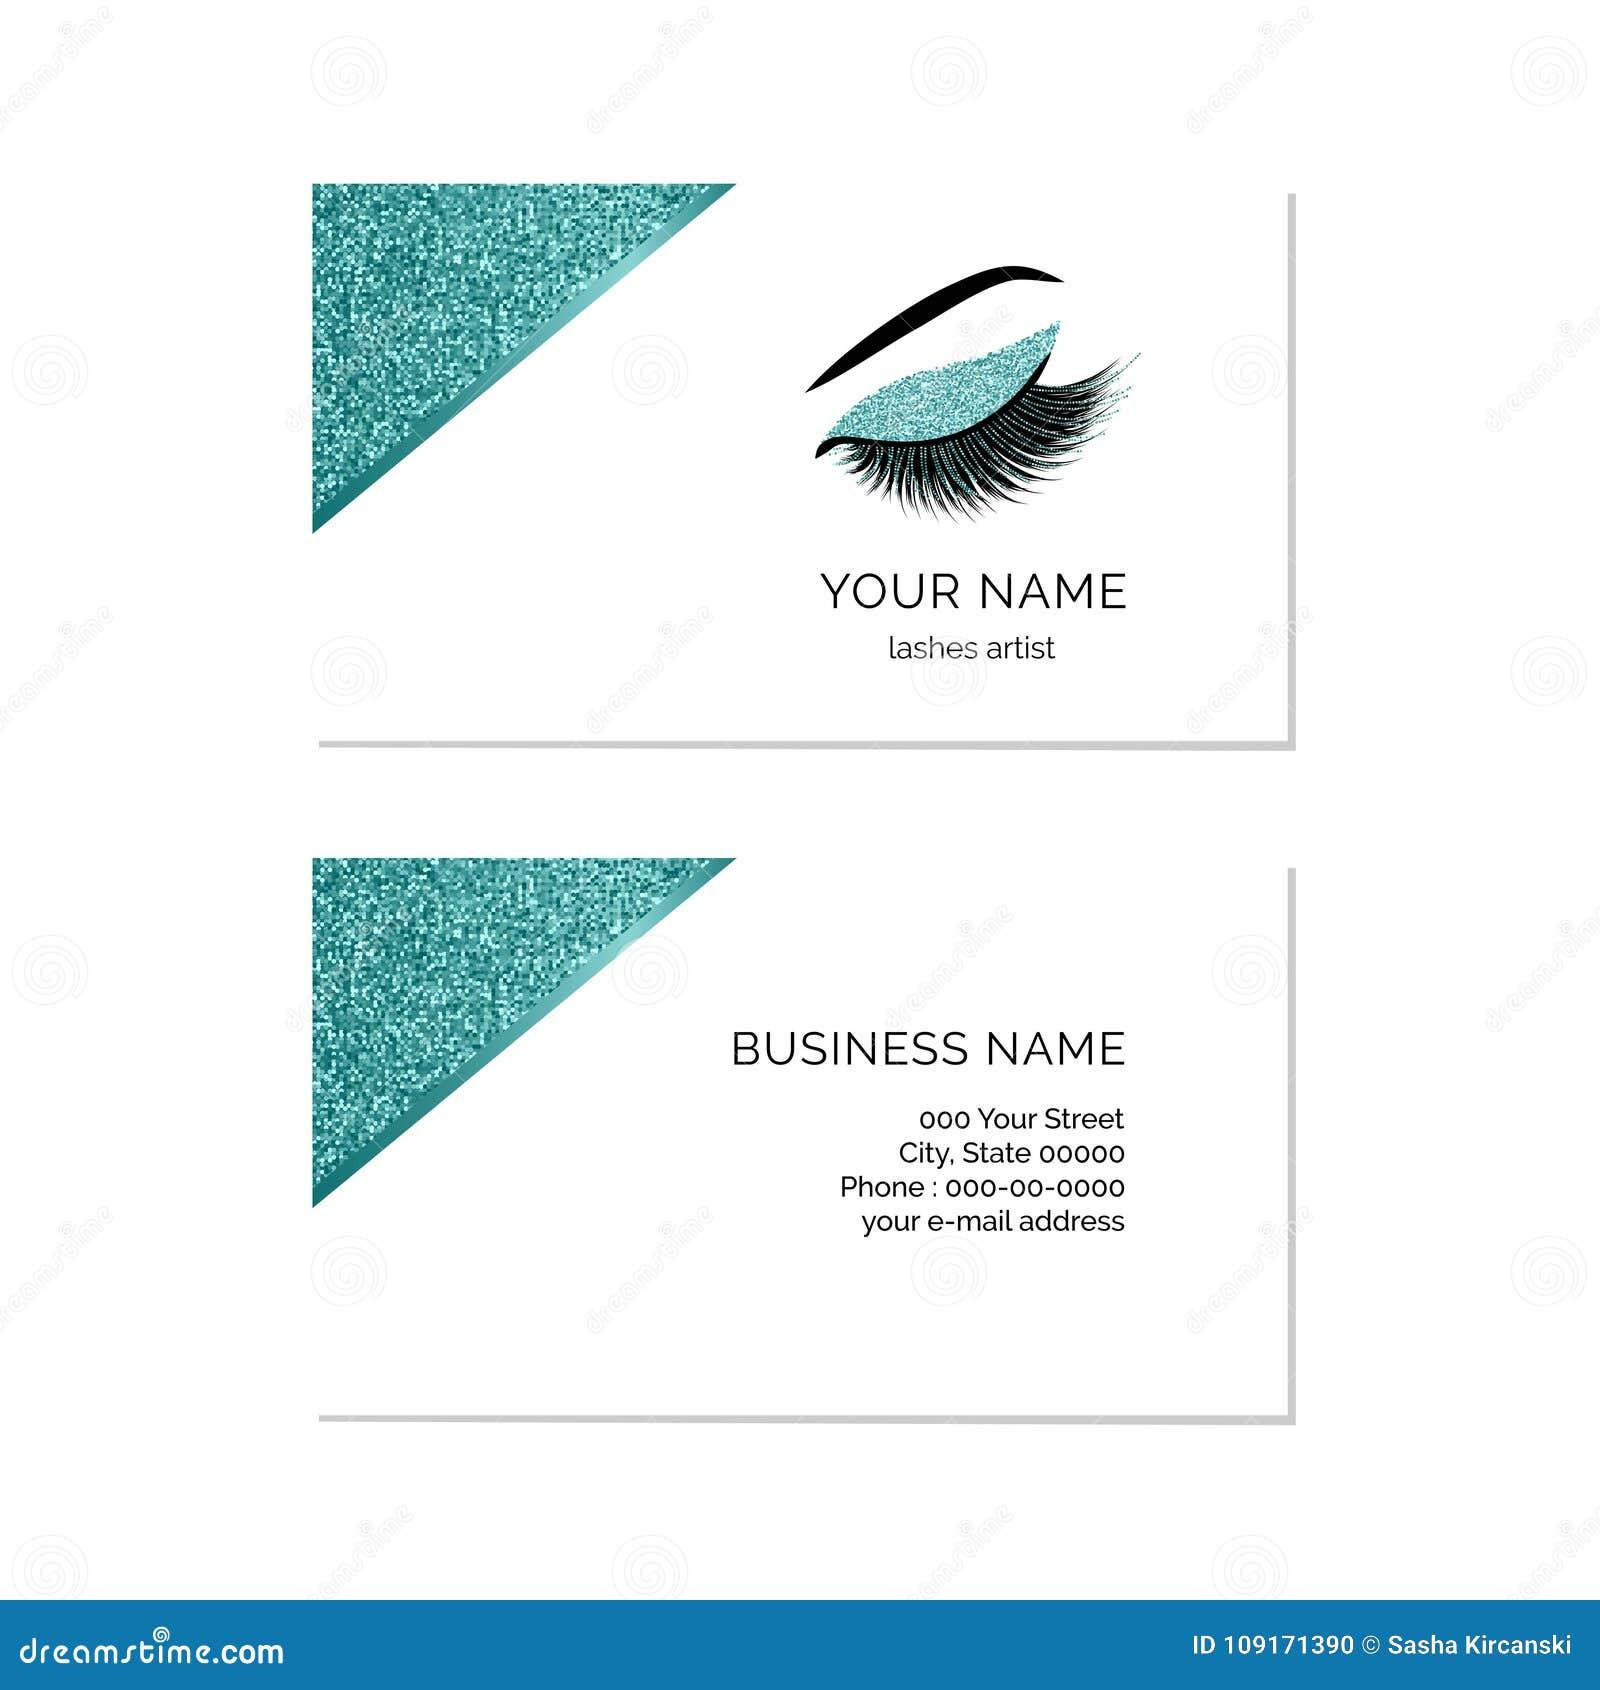 Makeup artist business card vector template stock vector download makeup artist business card vector template stock vector illustration of logo beautiful fbccfo Choice Image